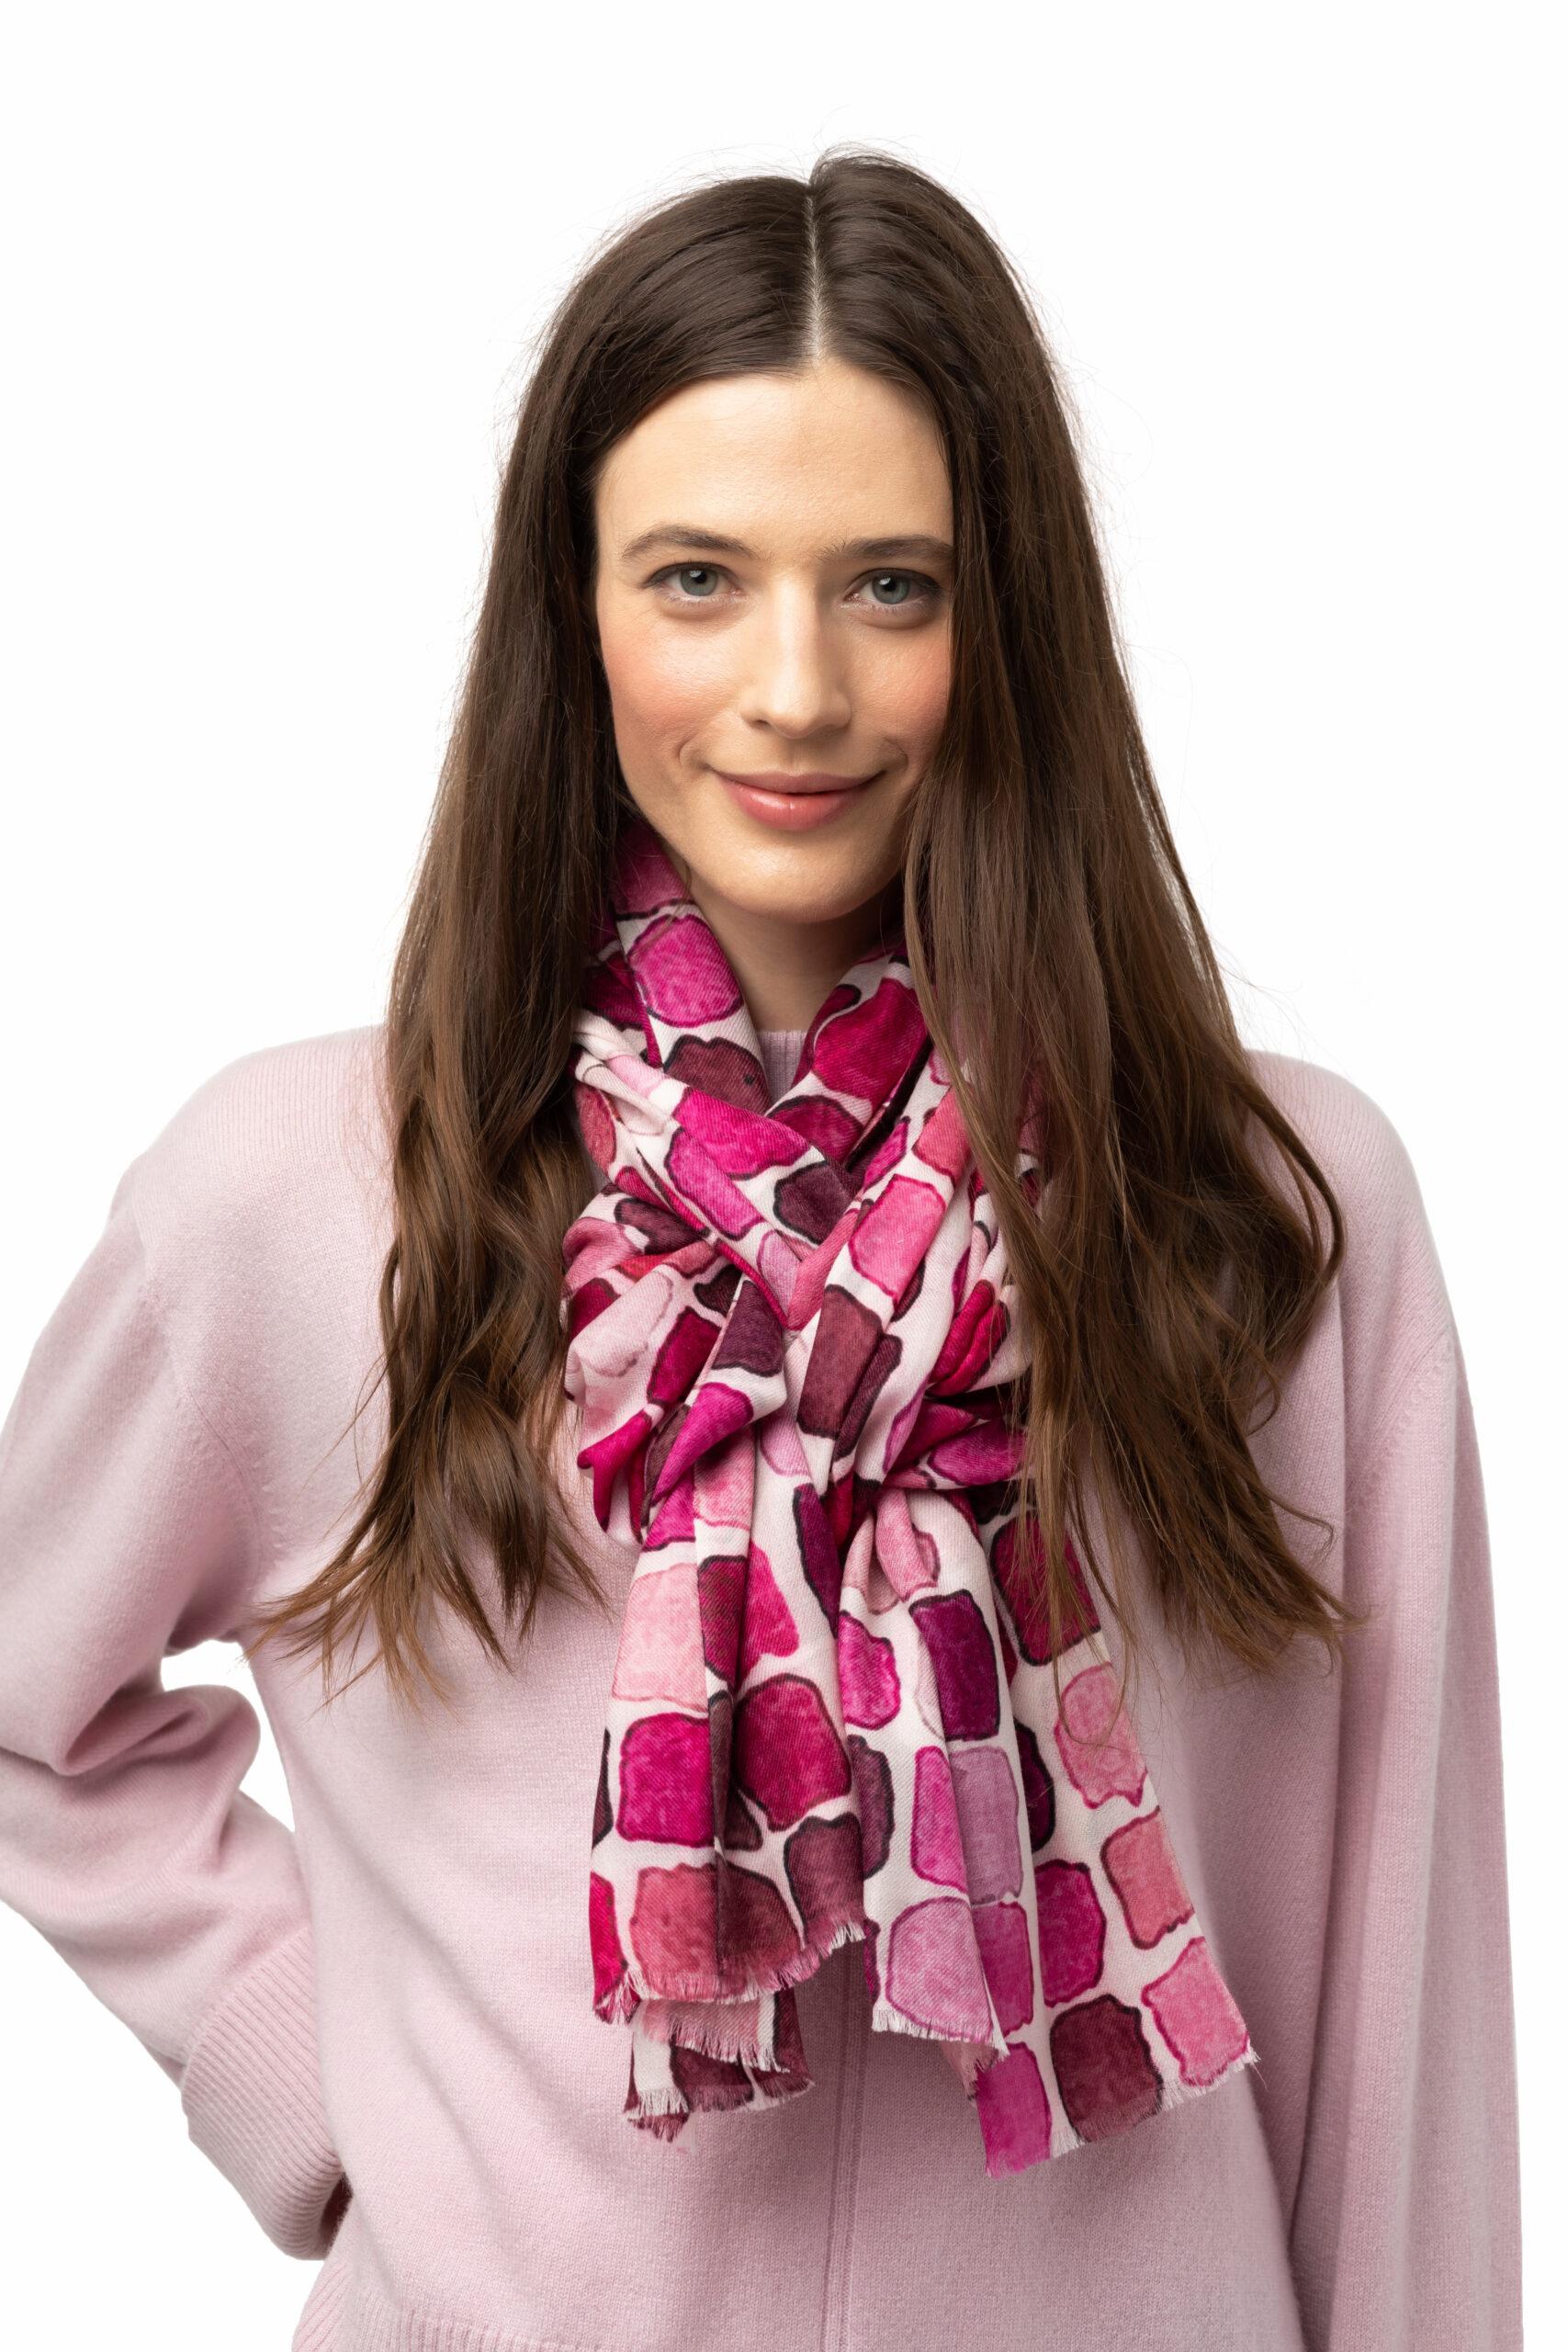 Vävd sjal - kashmirsjal av 8design Cashmere rosa